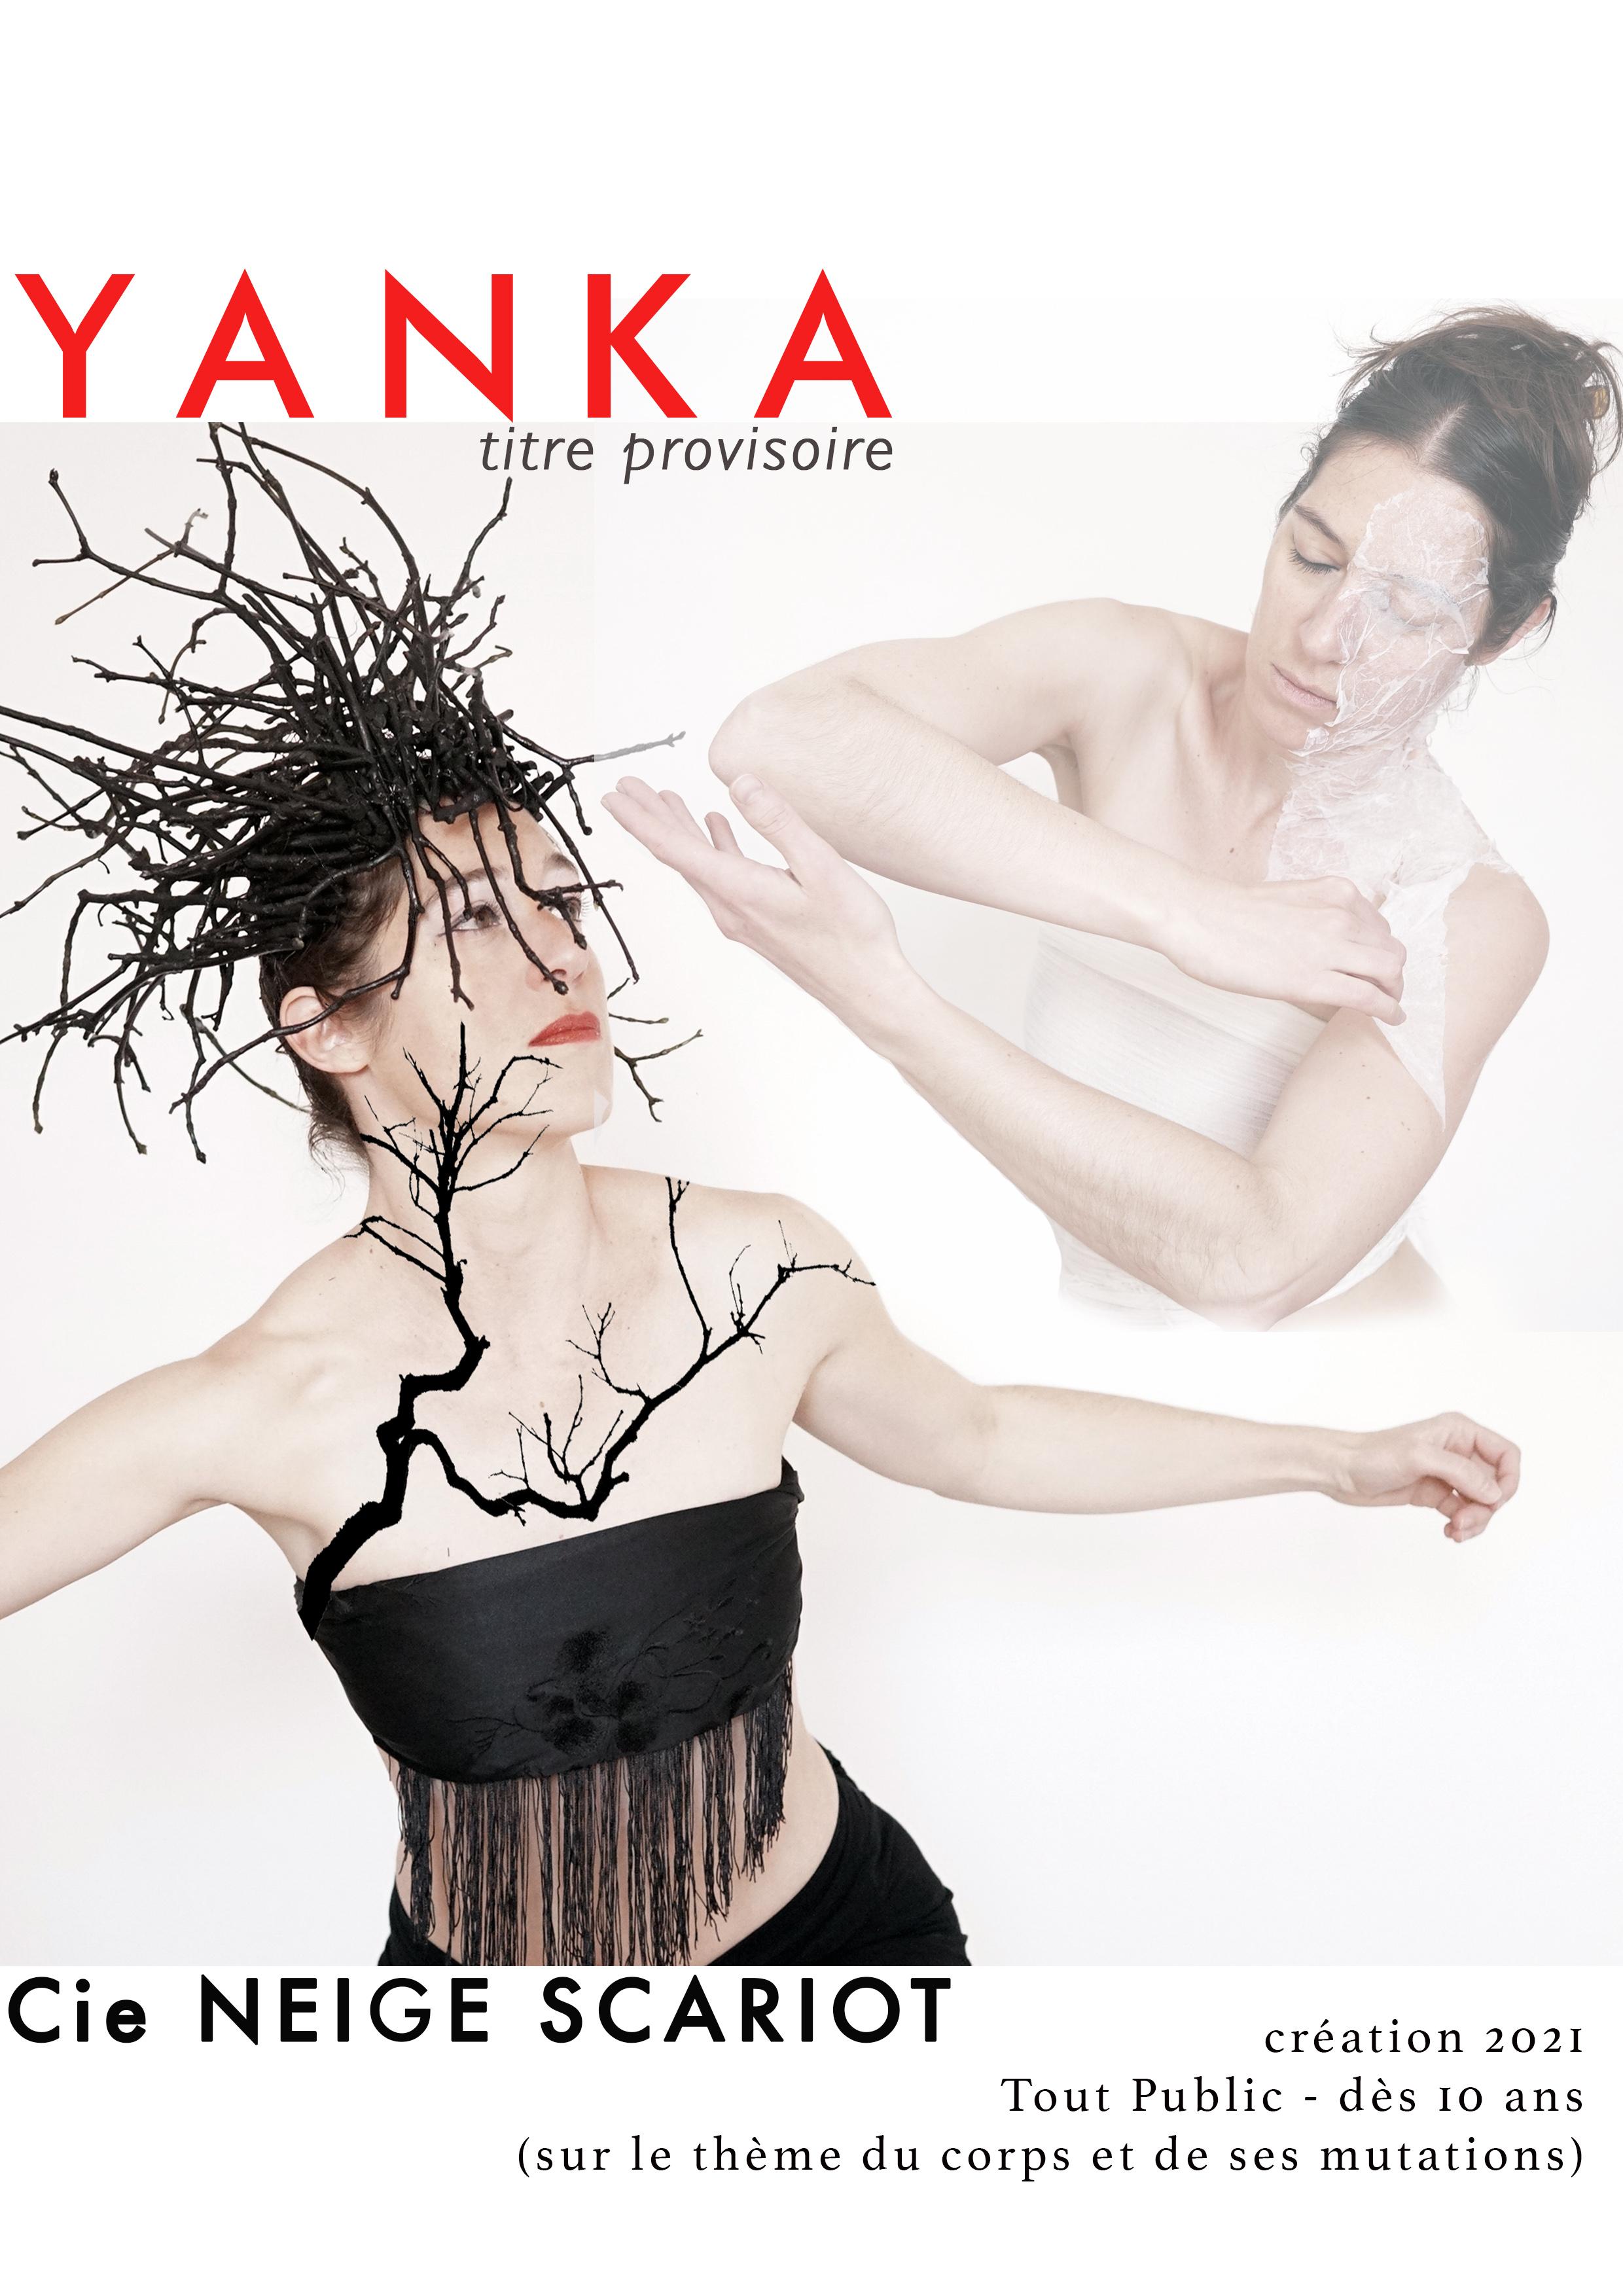 couverture book YANKA